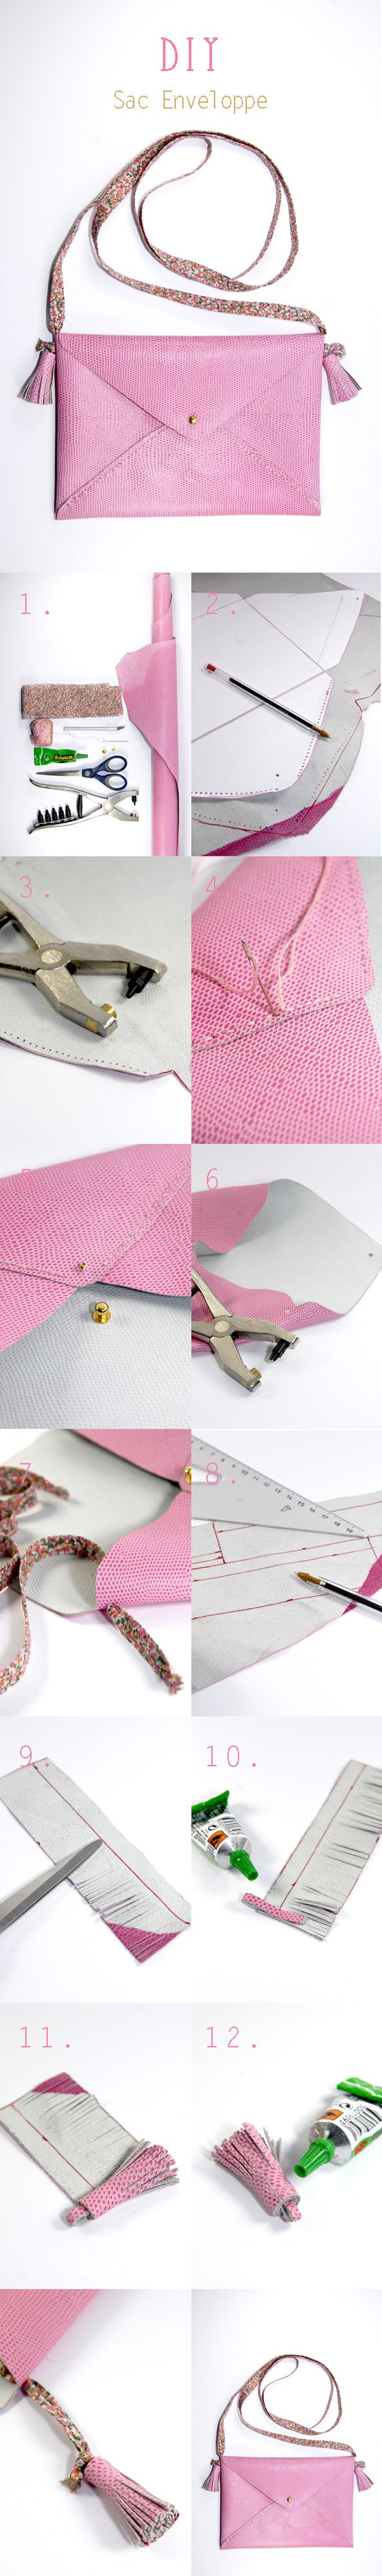 DIY SAC Envelope Bag with Tassles